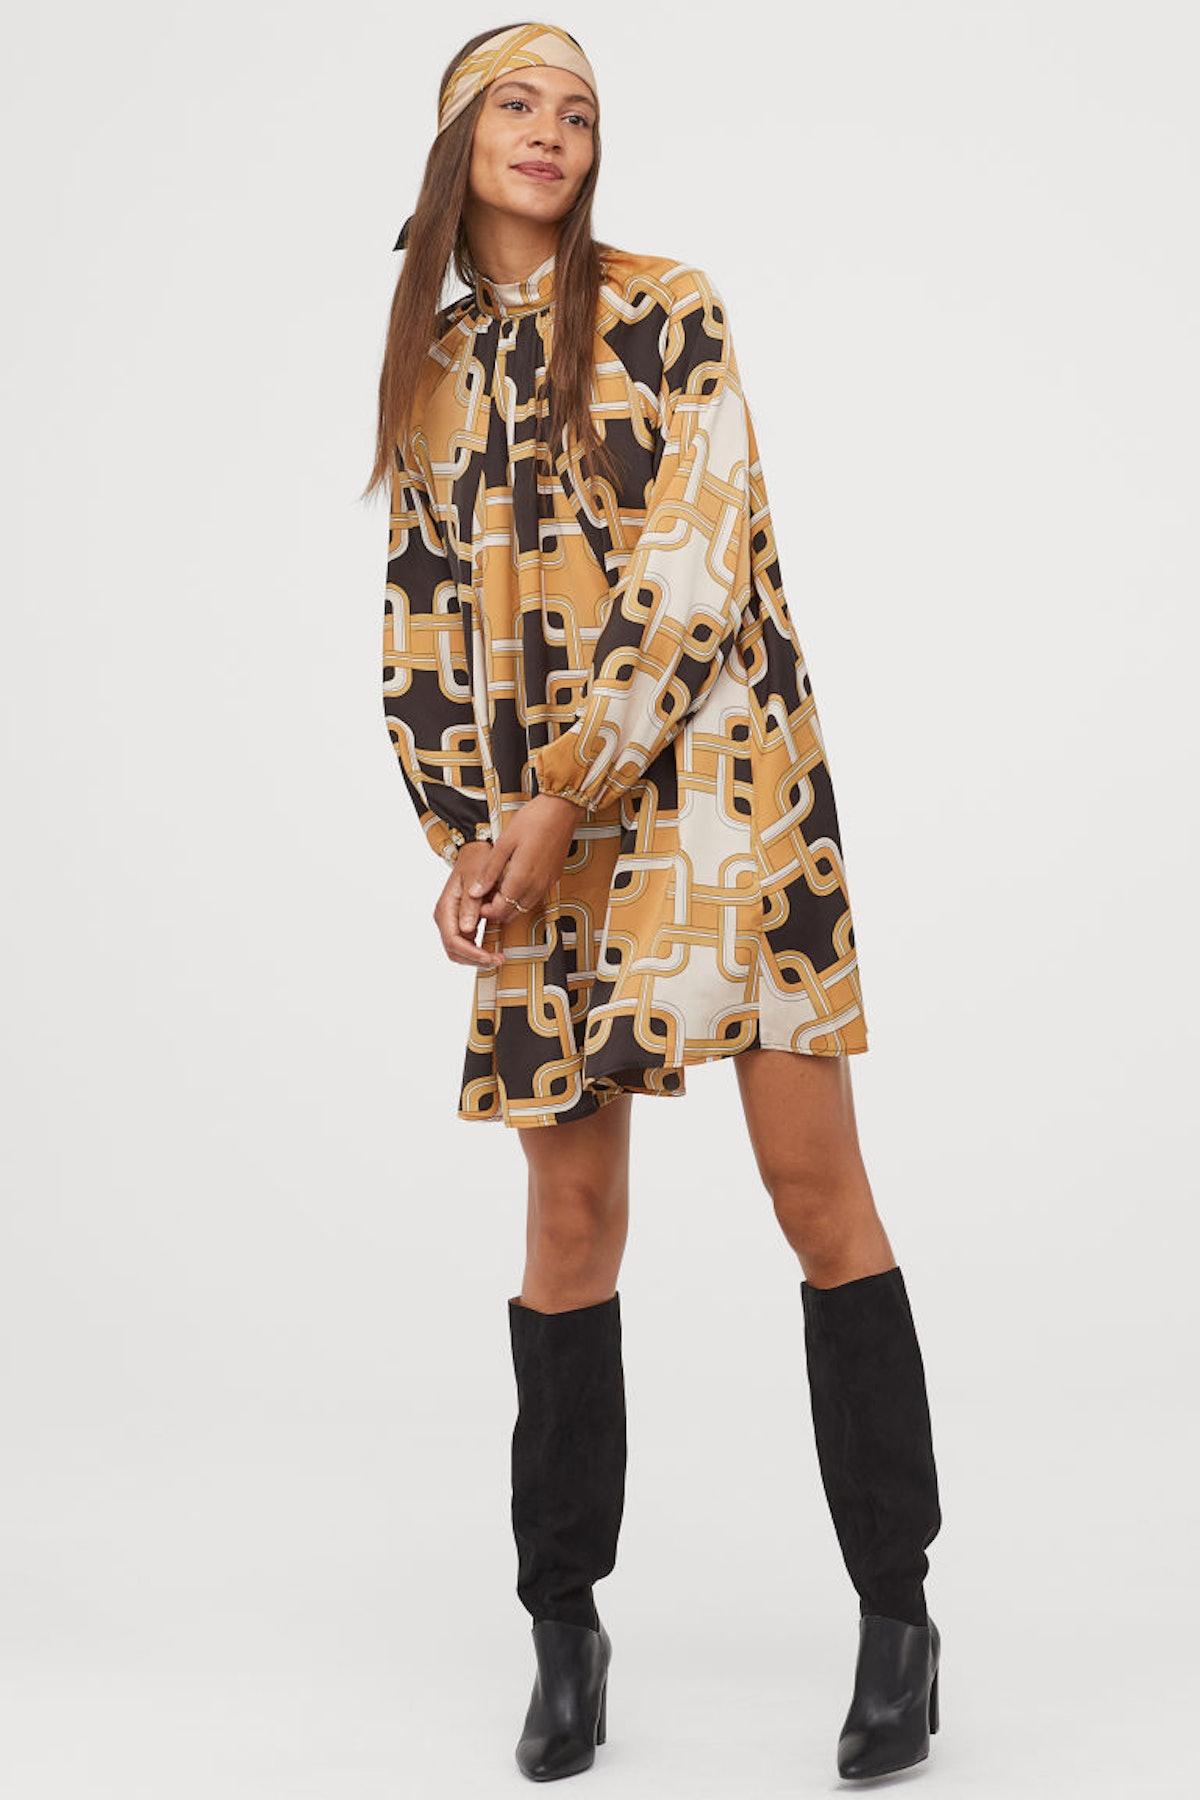 H&M Stand-Up Collar Satin Dress